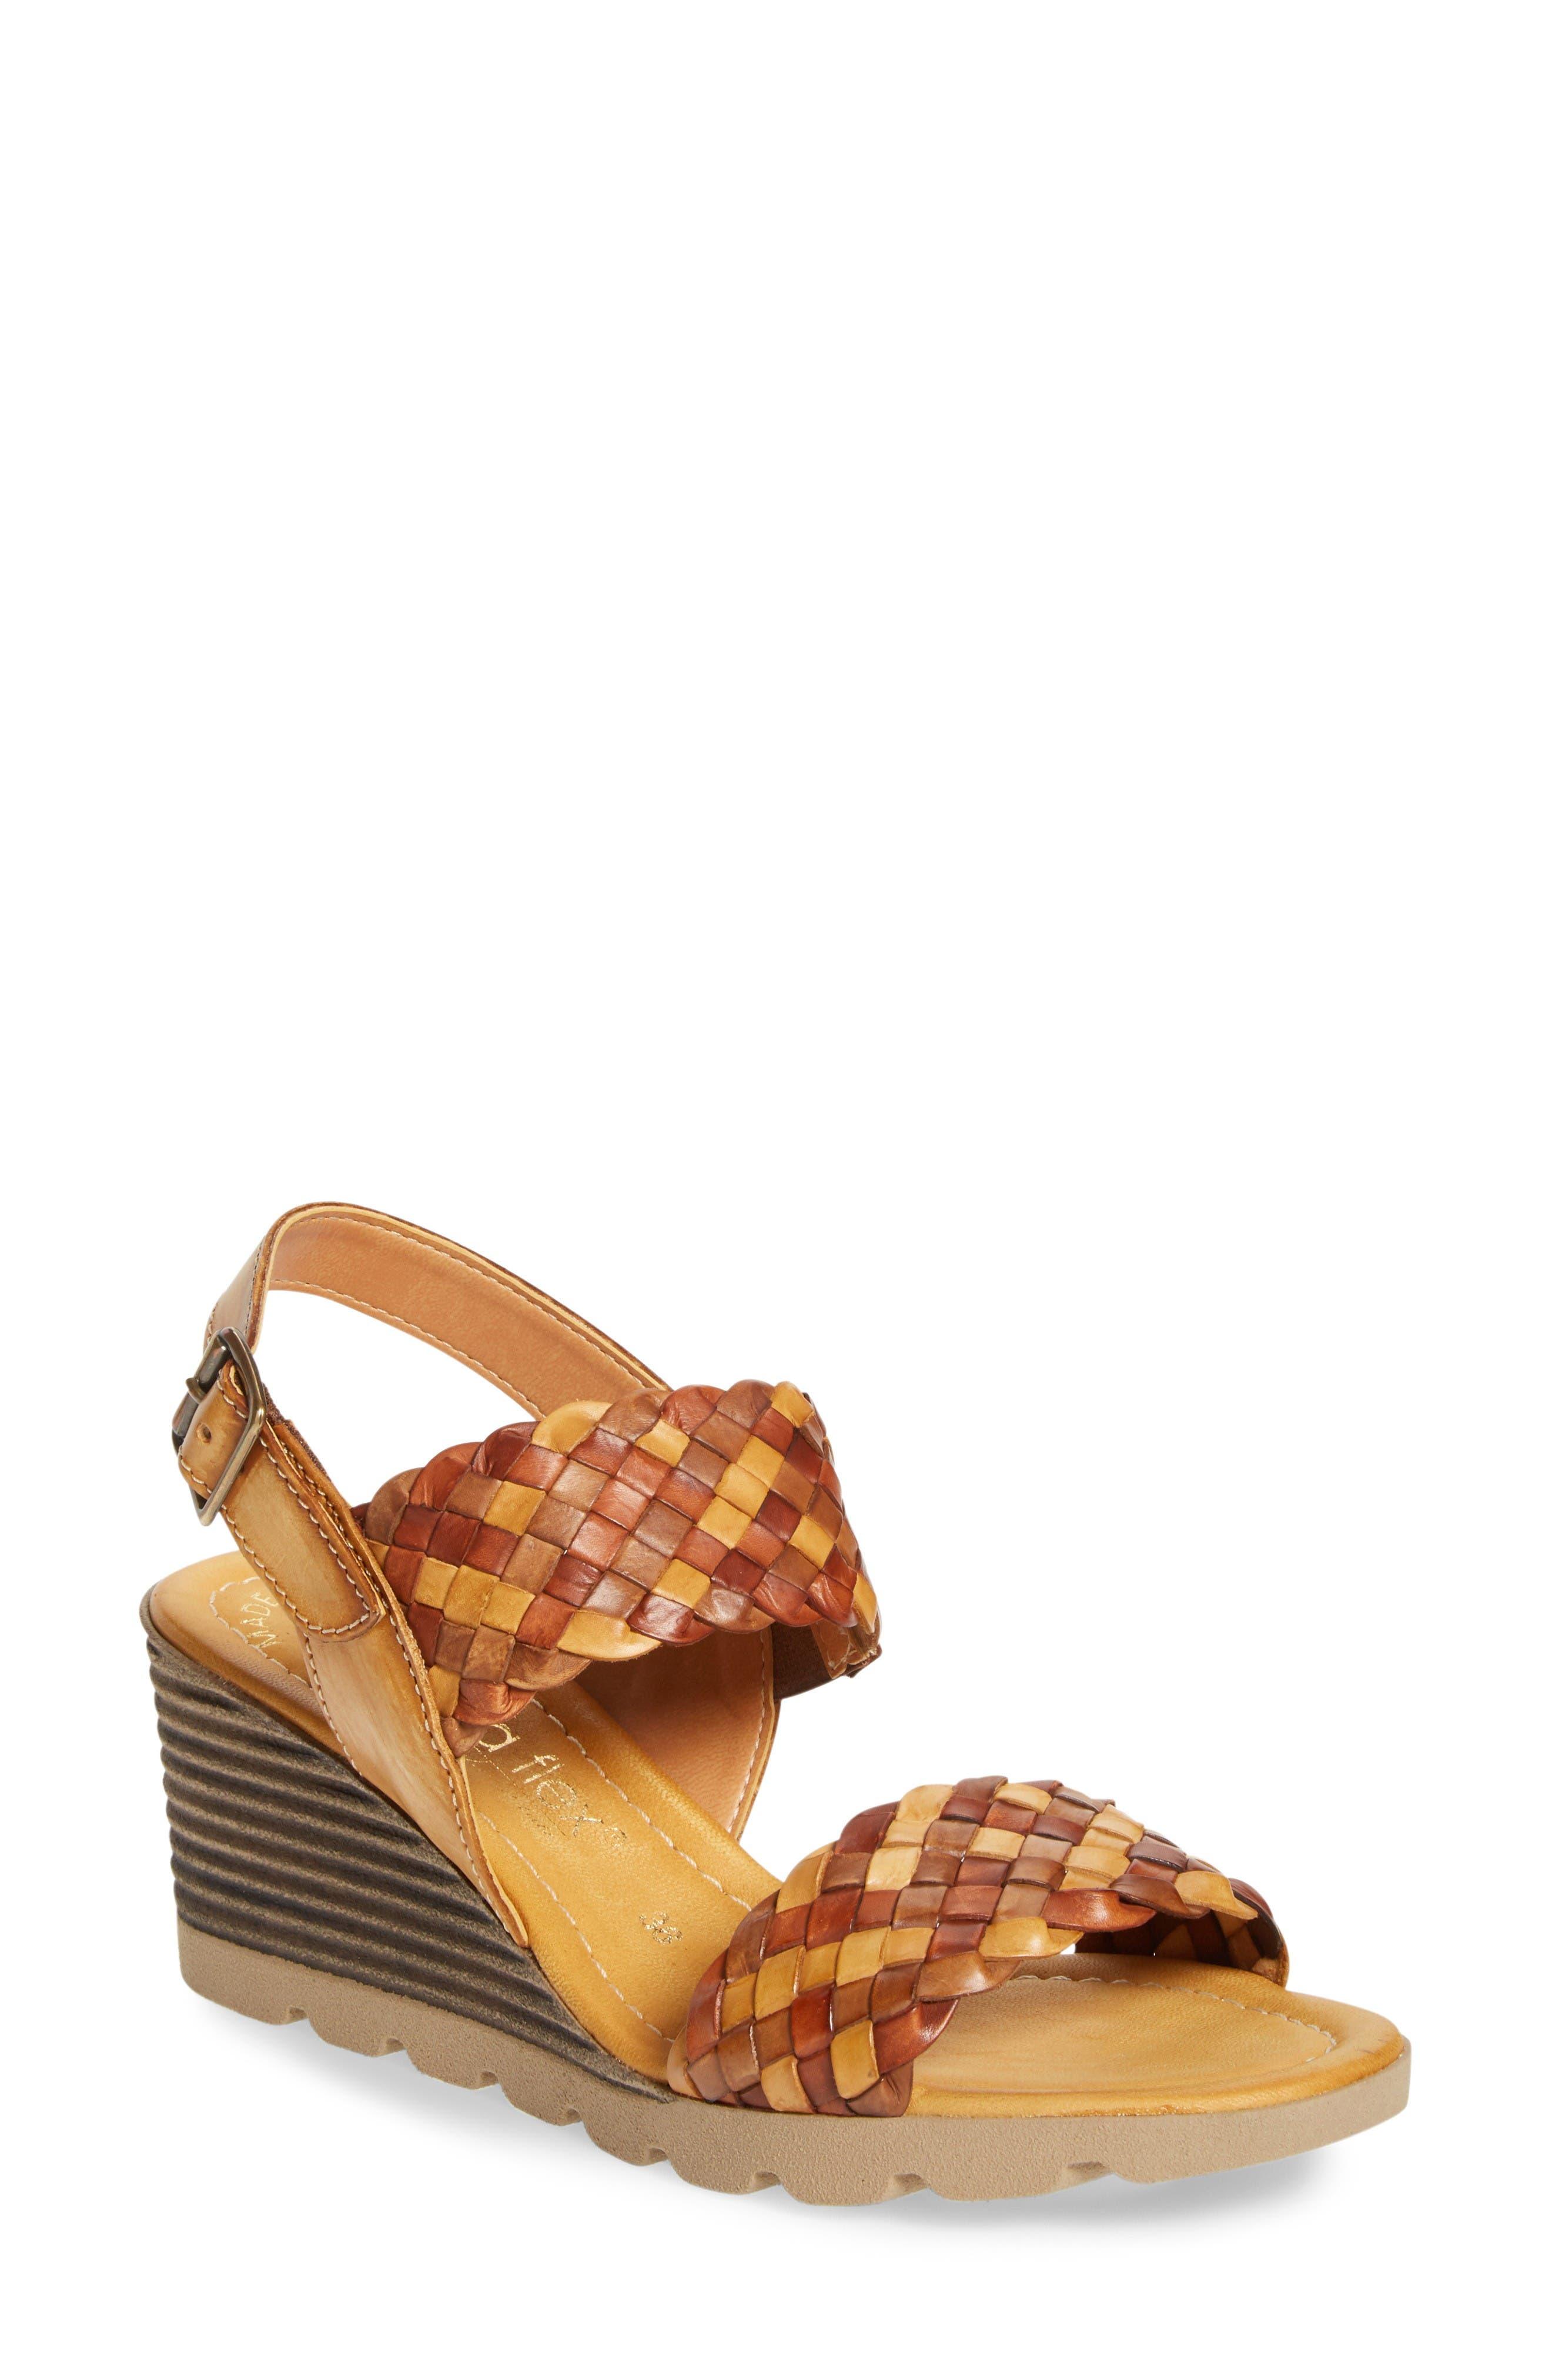 Alternate Image 1 Selected - Napa Flex Cool Wedge Sandal (Women)